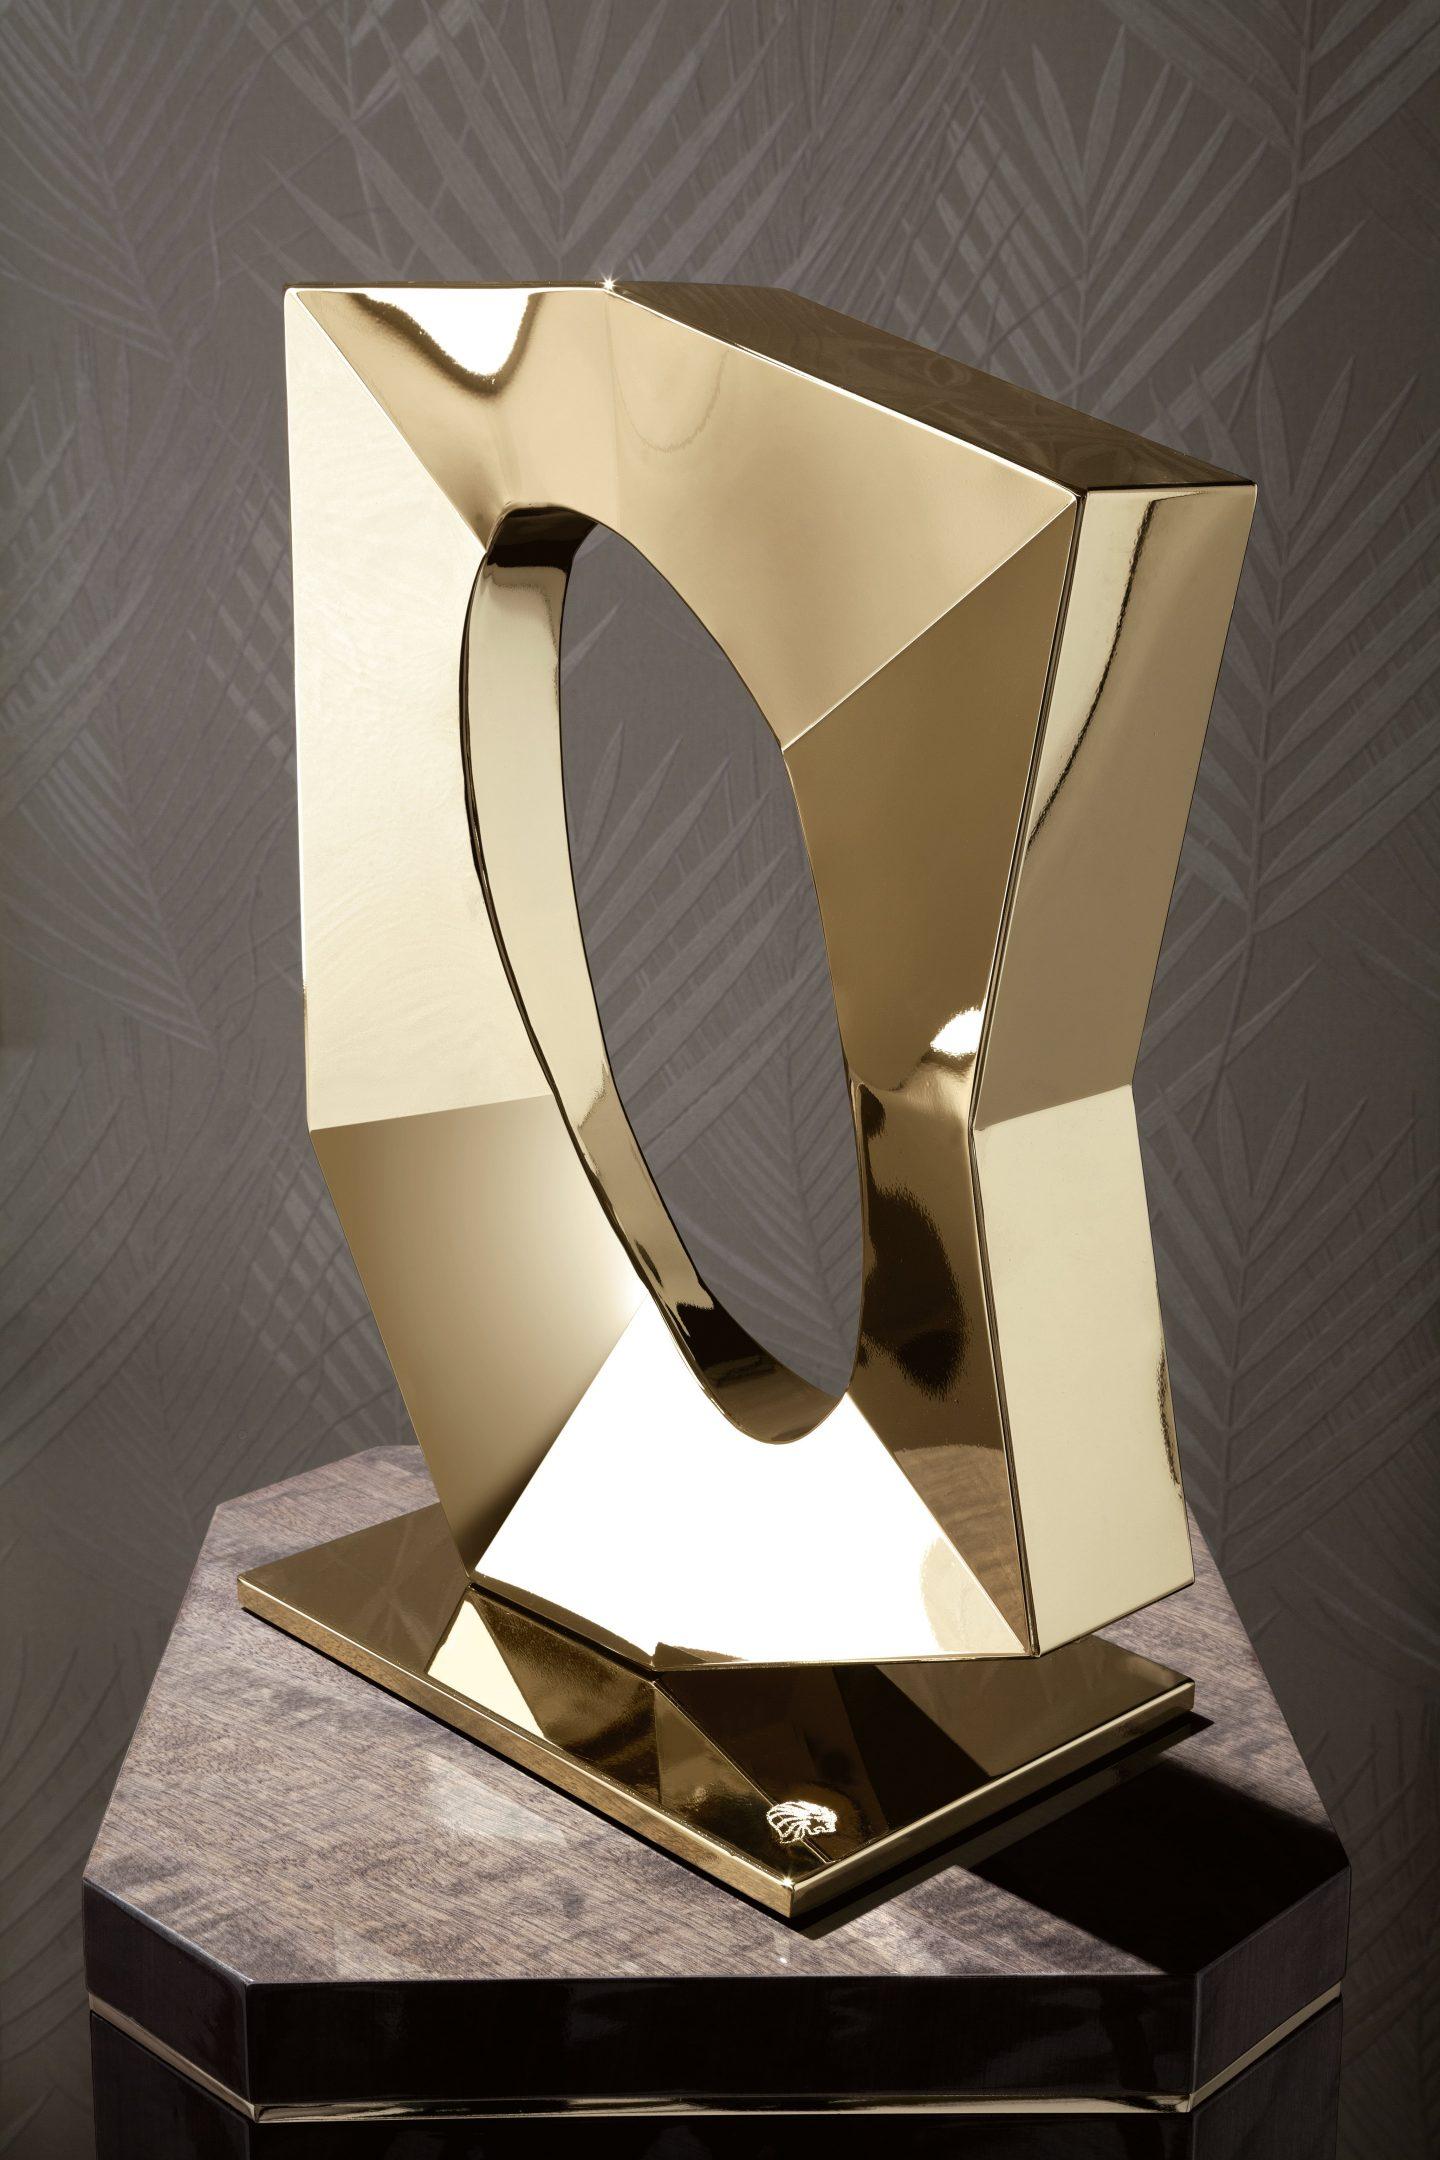 Infinity Phantasy Sculpture